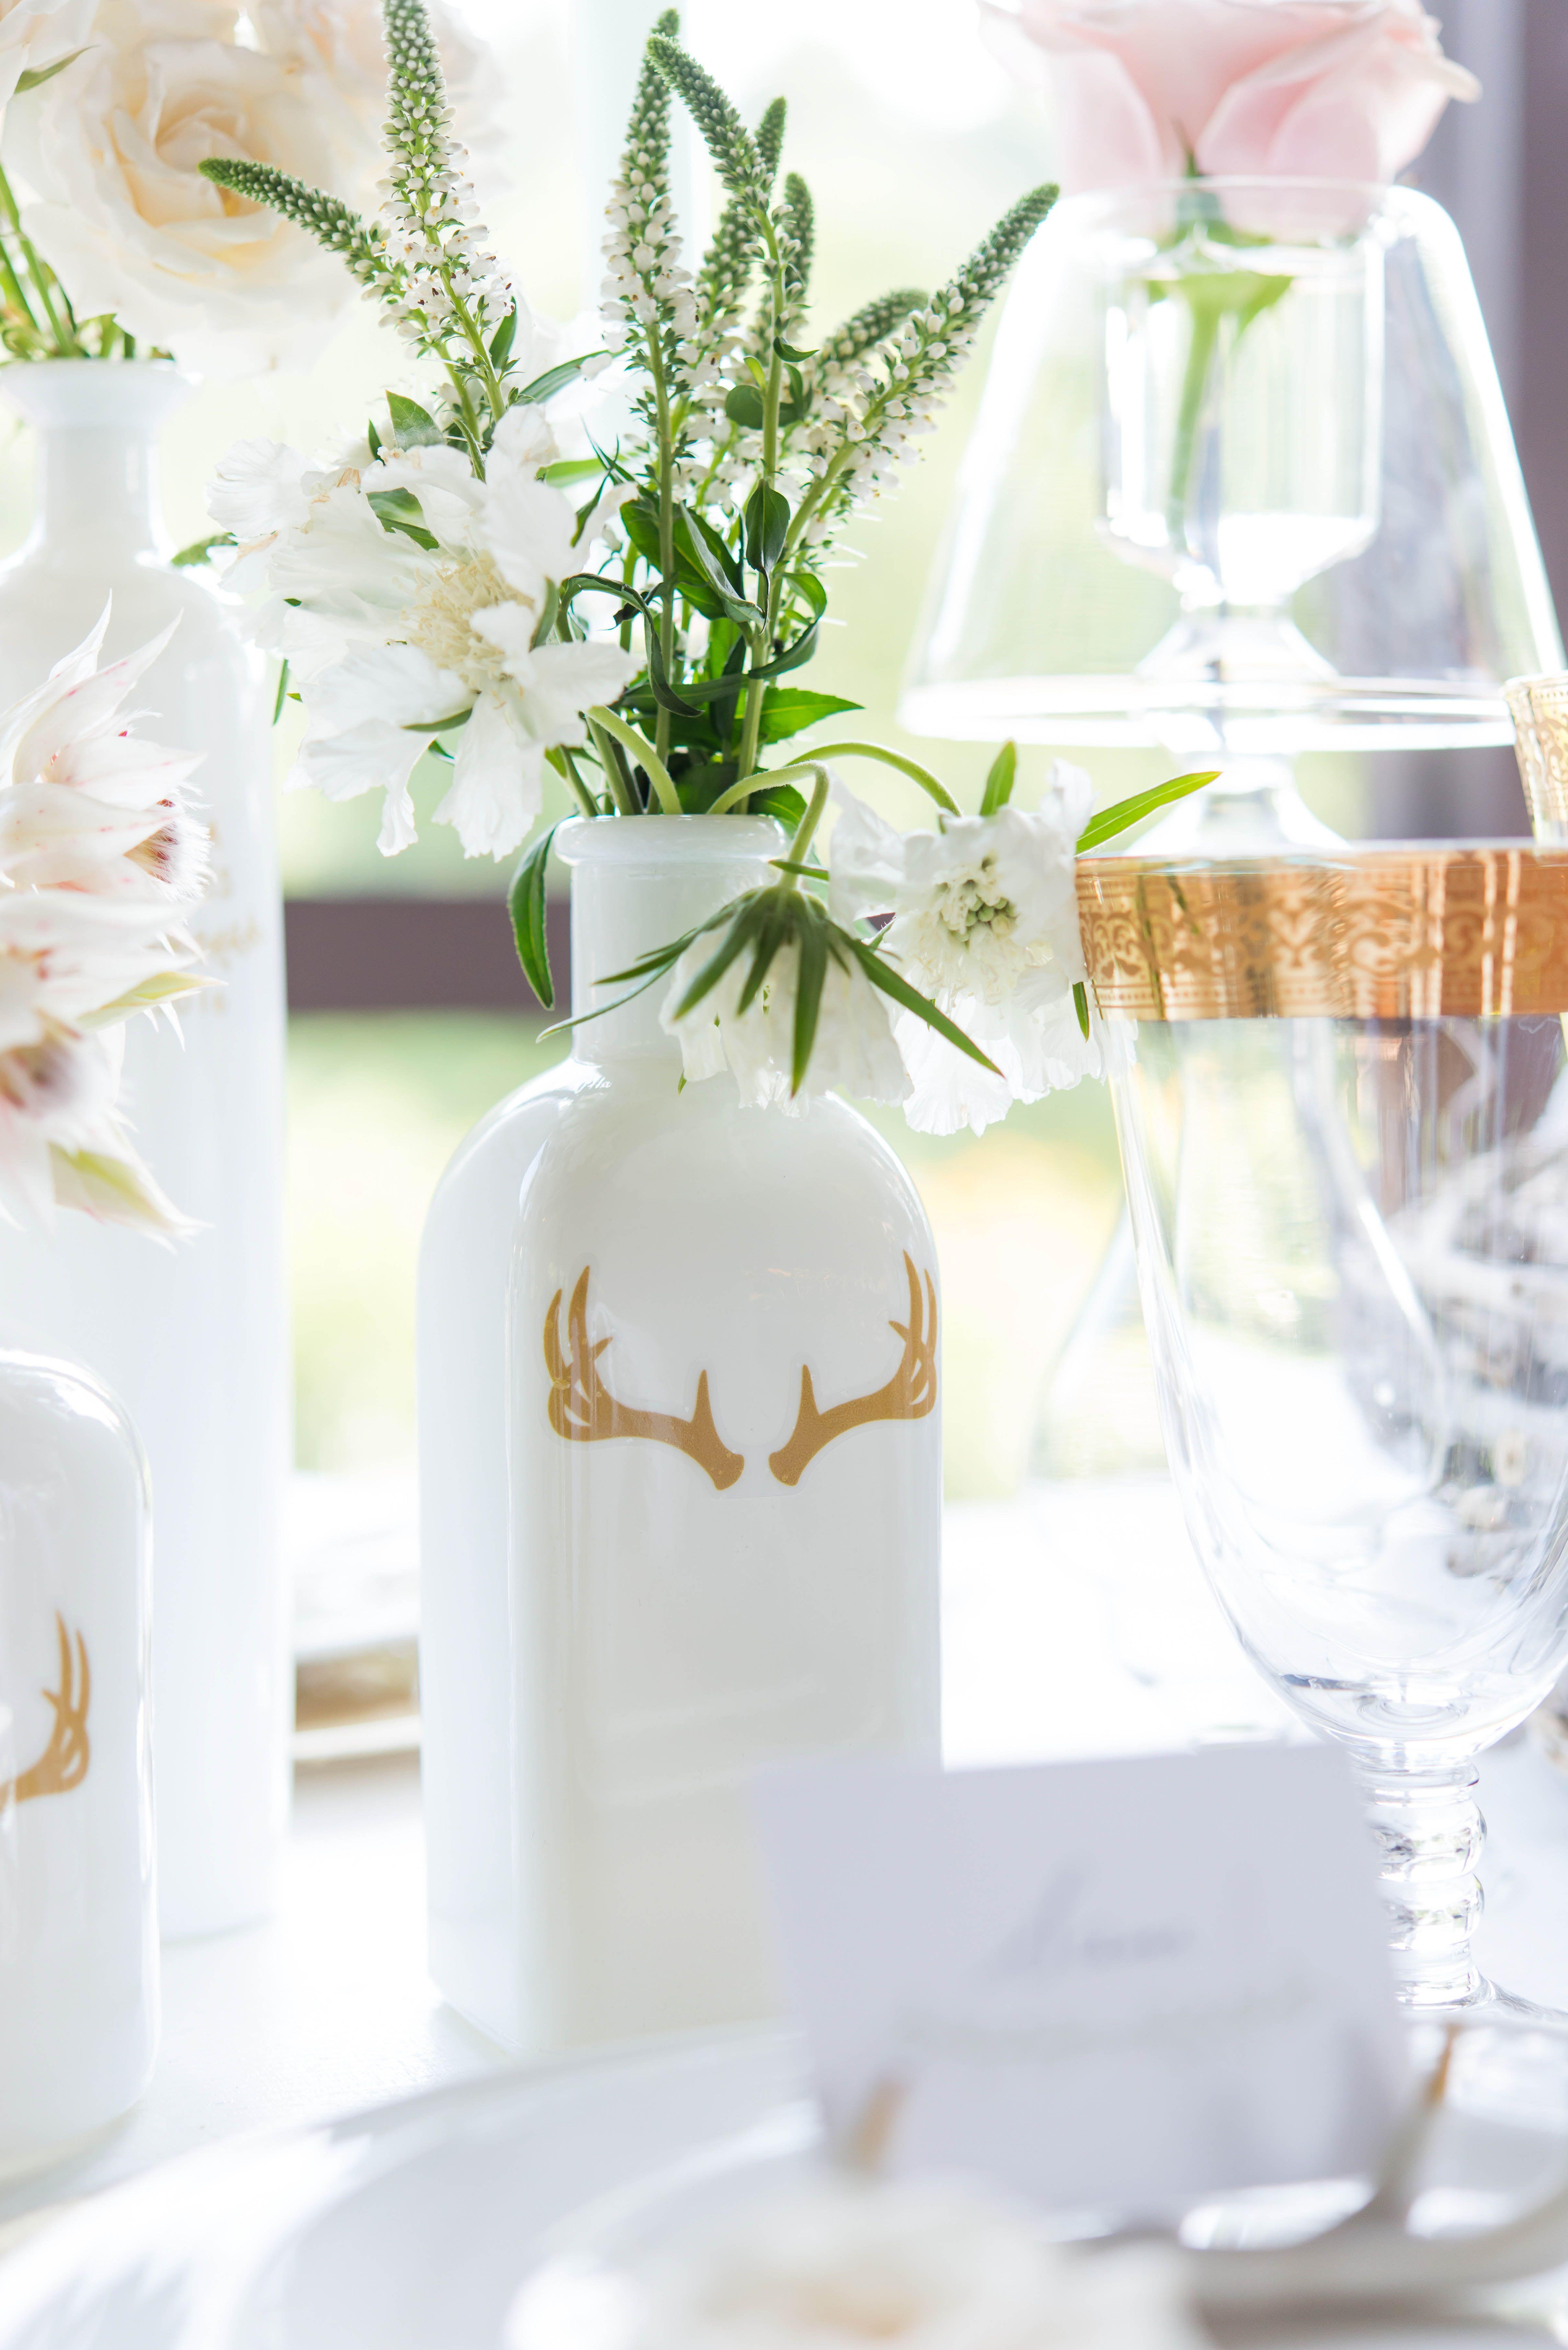 Nature Wedding Theme | Yet another wedding ideas board | Pinterest ...